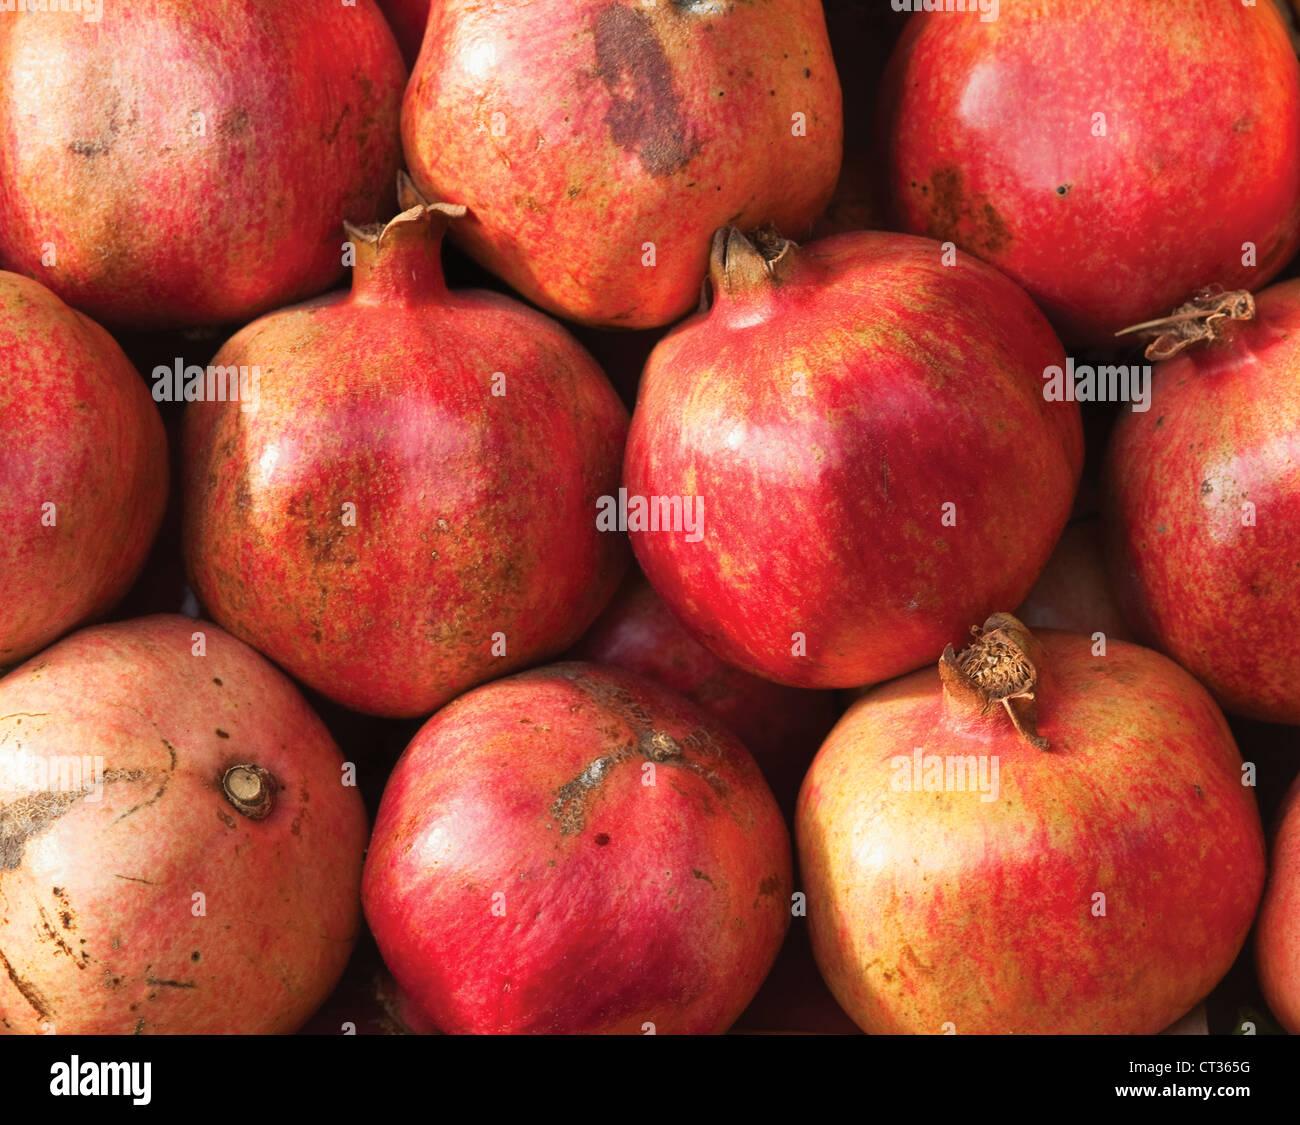 Punica, Pomegranate - Stock Image